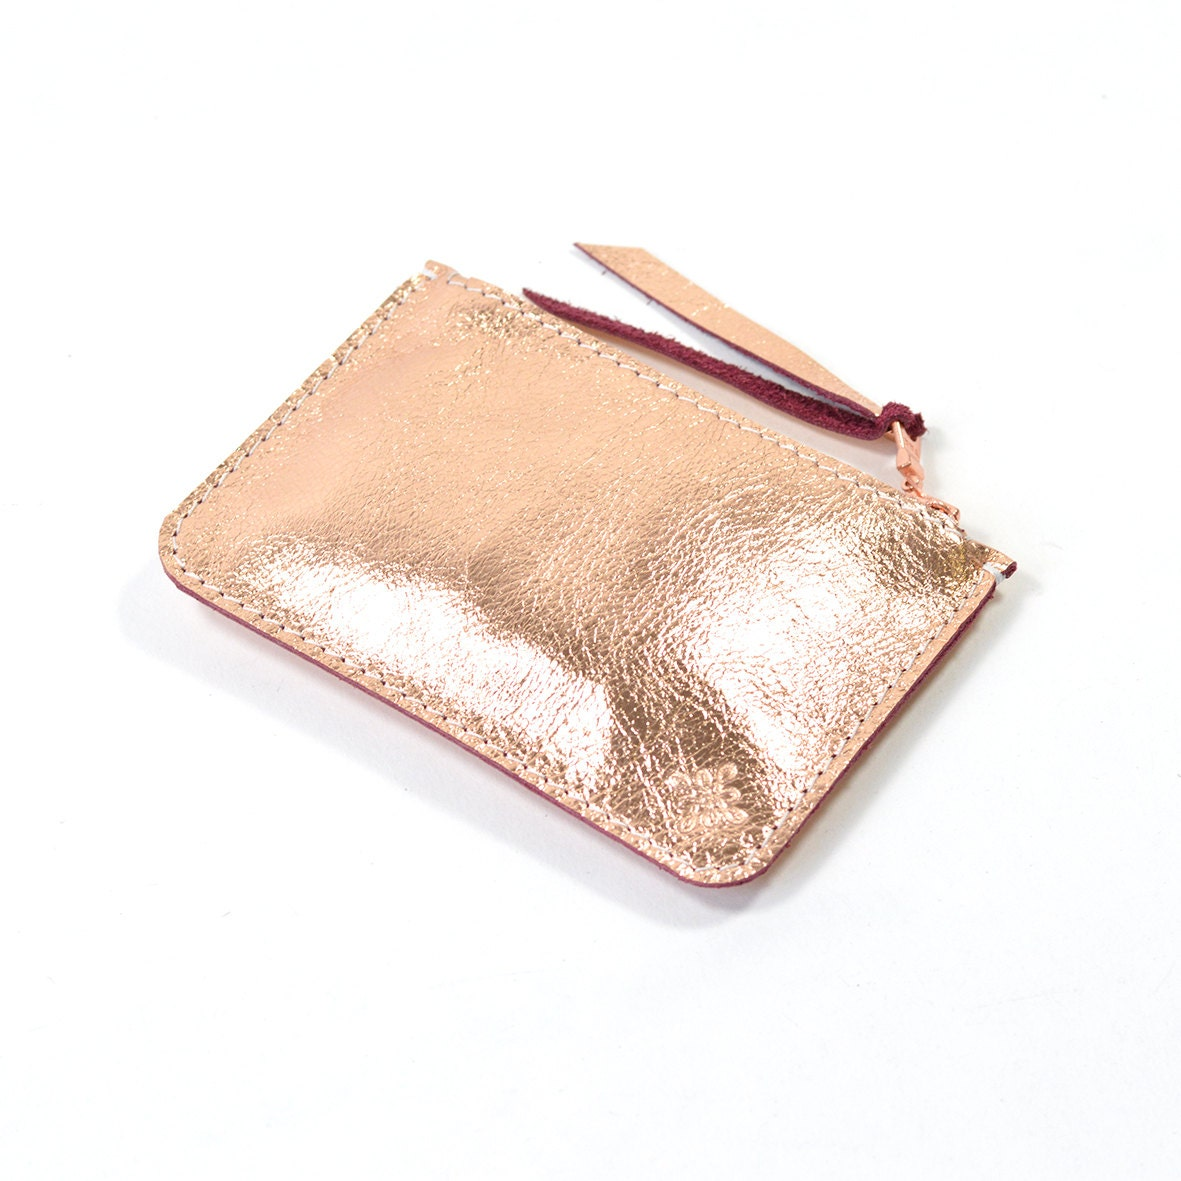 metallic rose gold copper leather zip pouch purse wallet. Black Bedroom Furniture Sets. Home Design Ideas